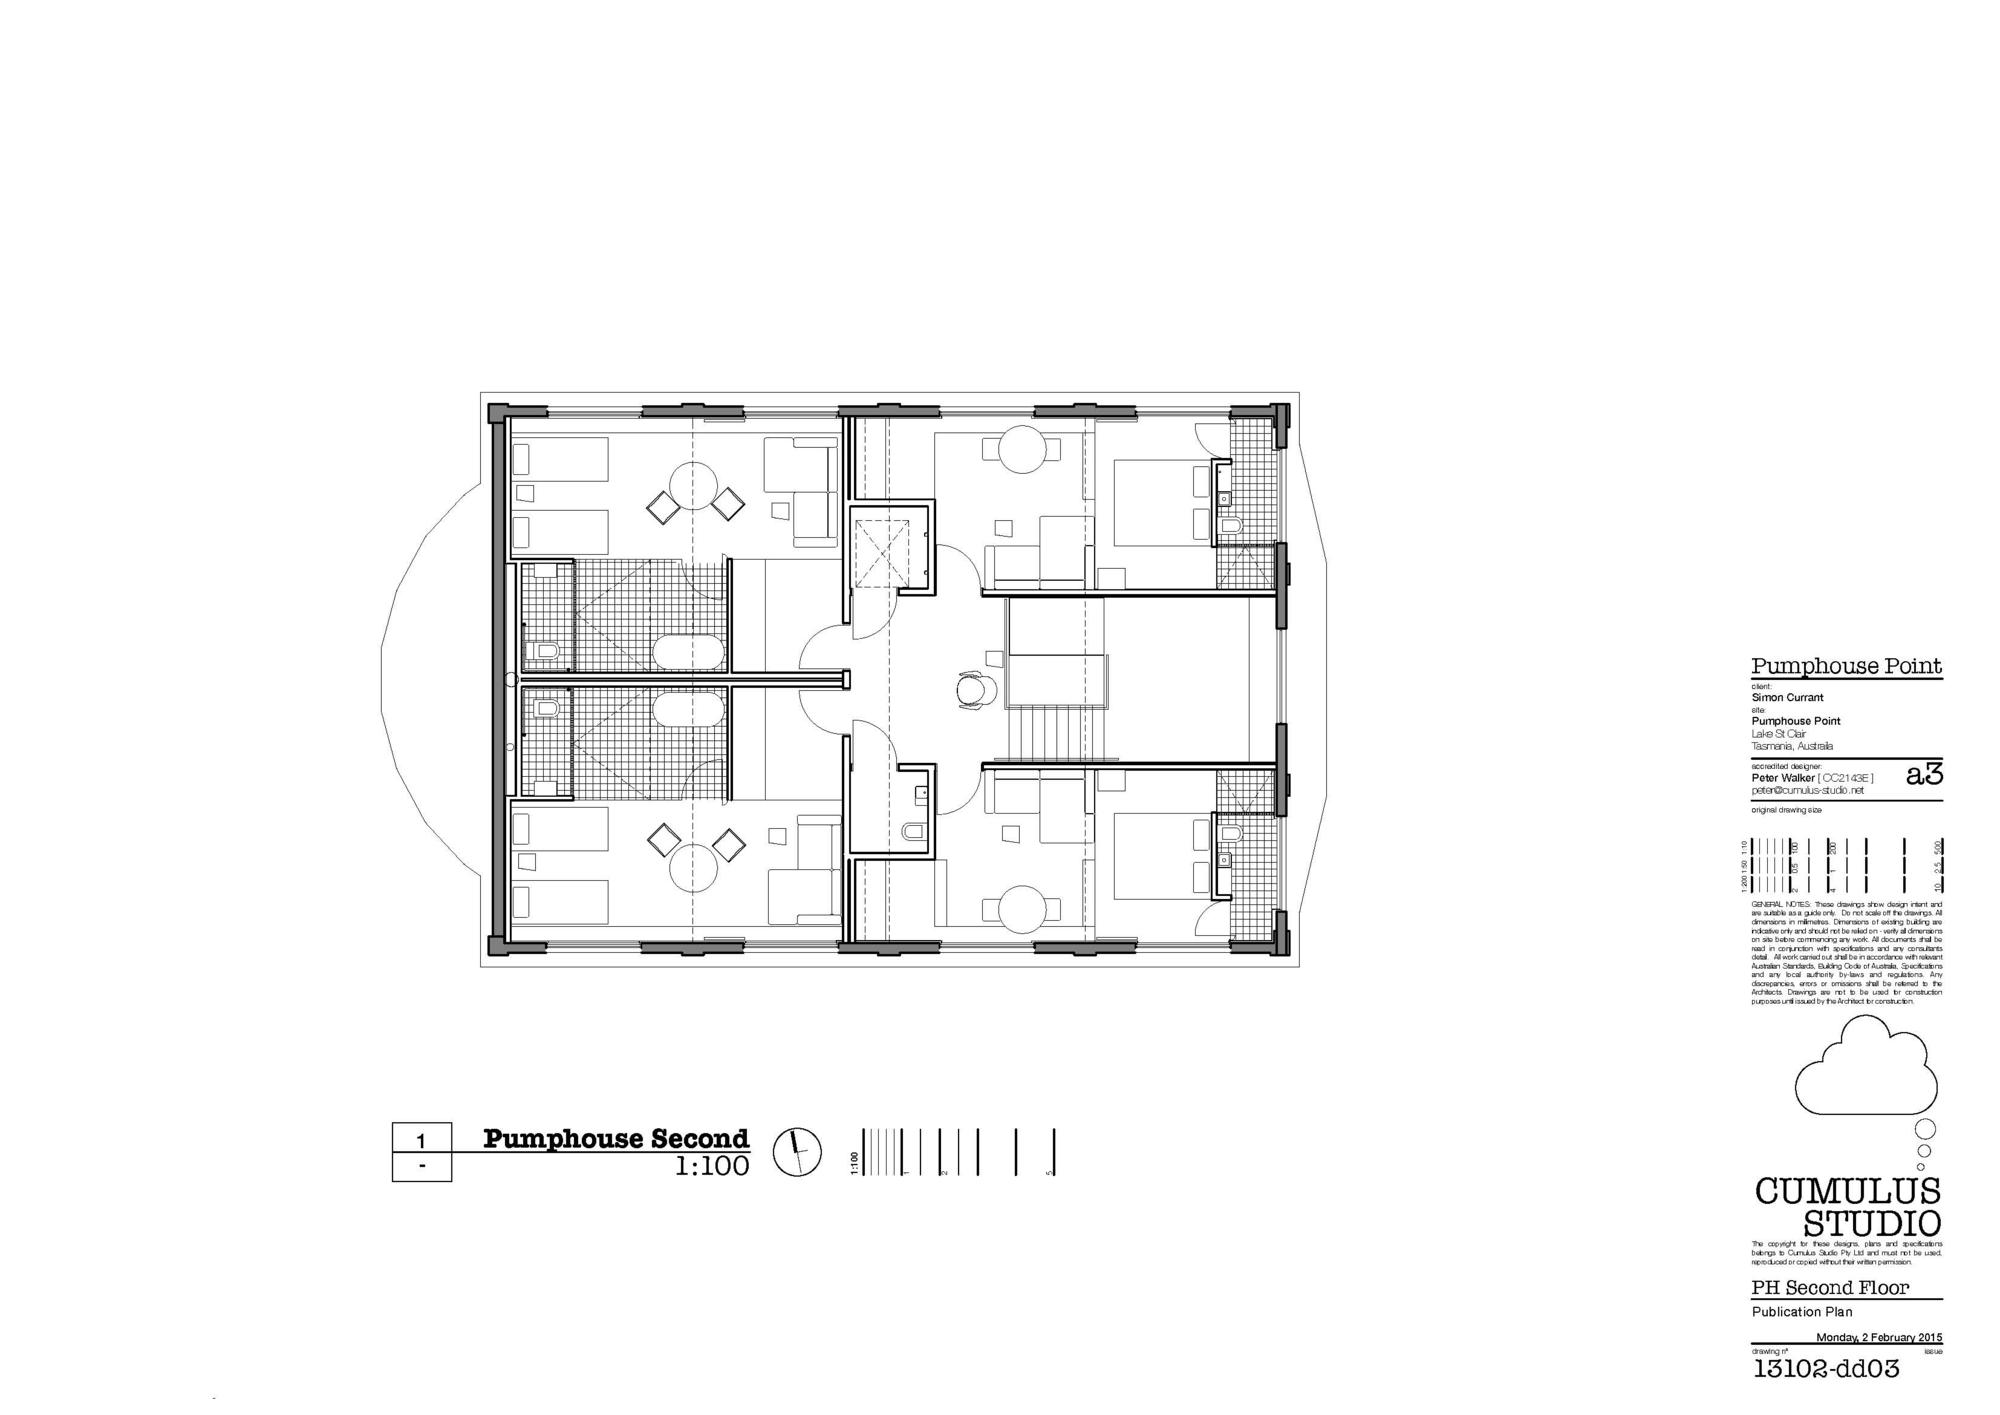 Pumphouse_Point-Cumulus_Studio-34